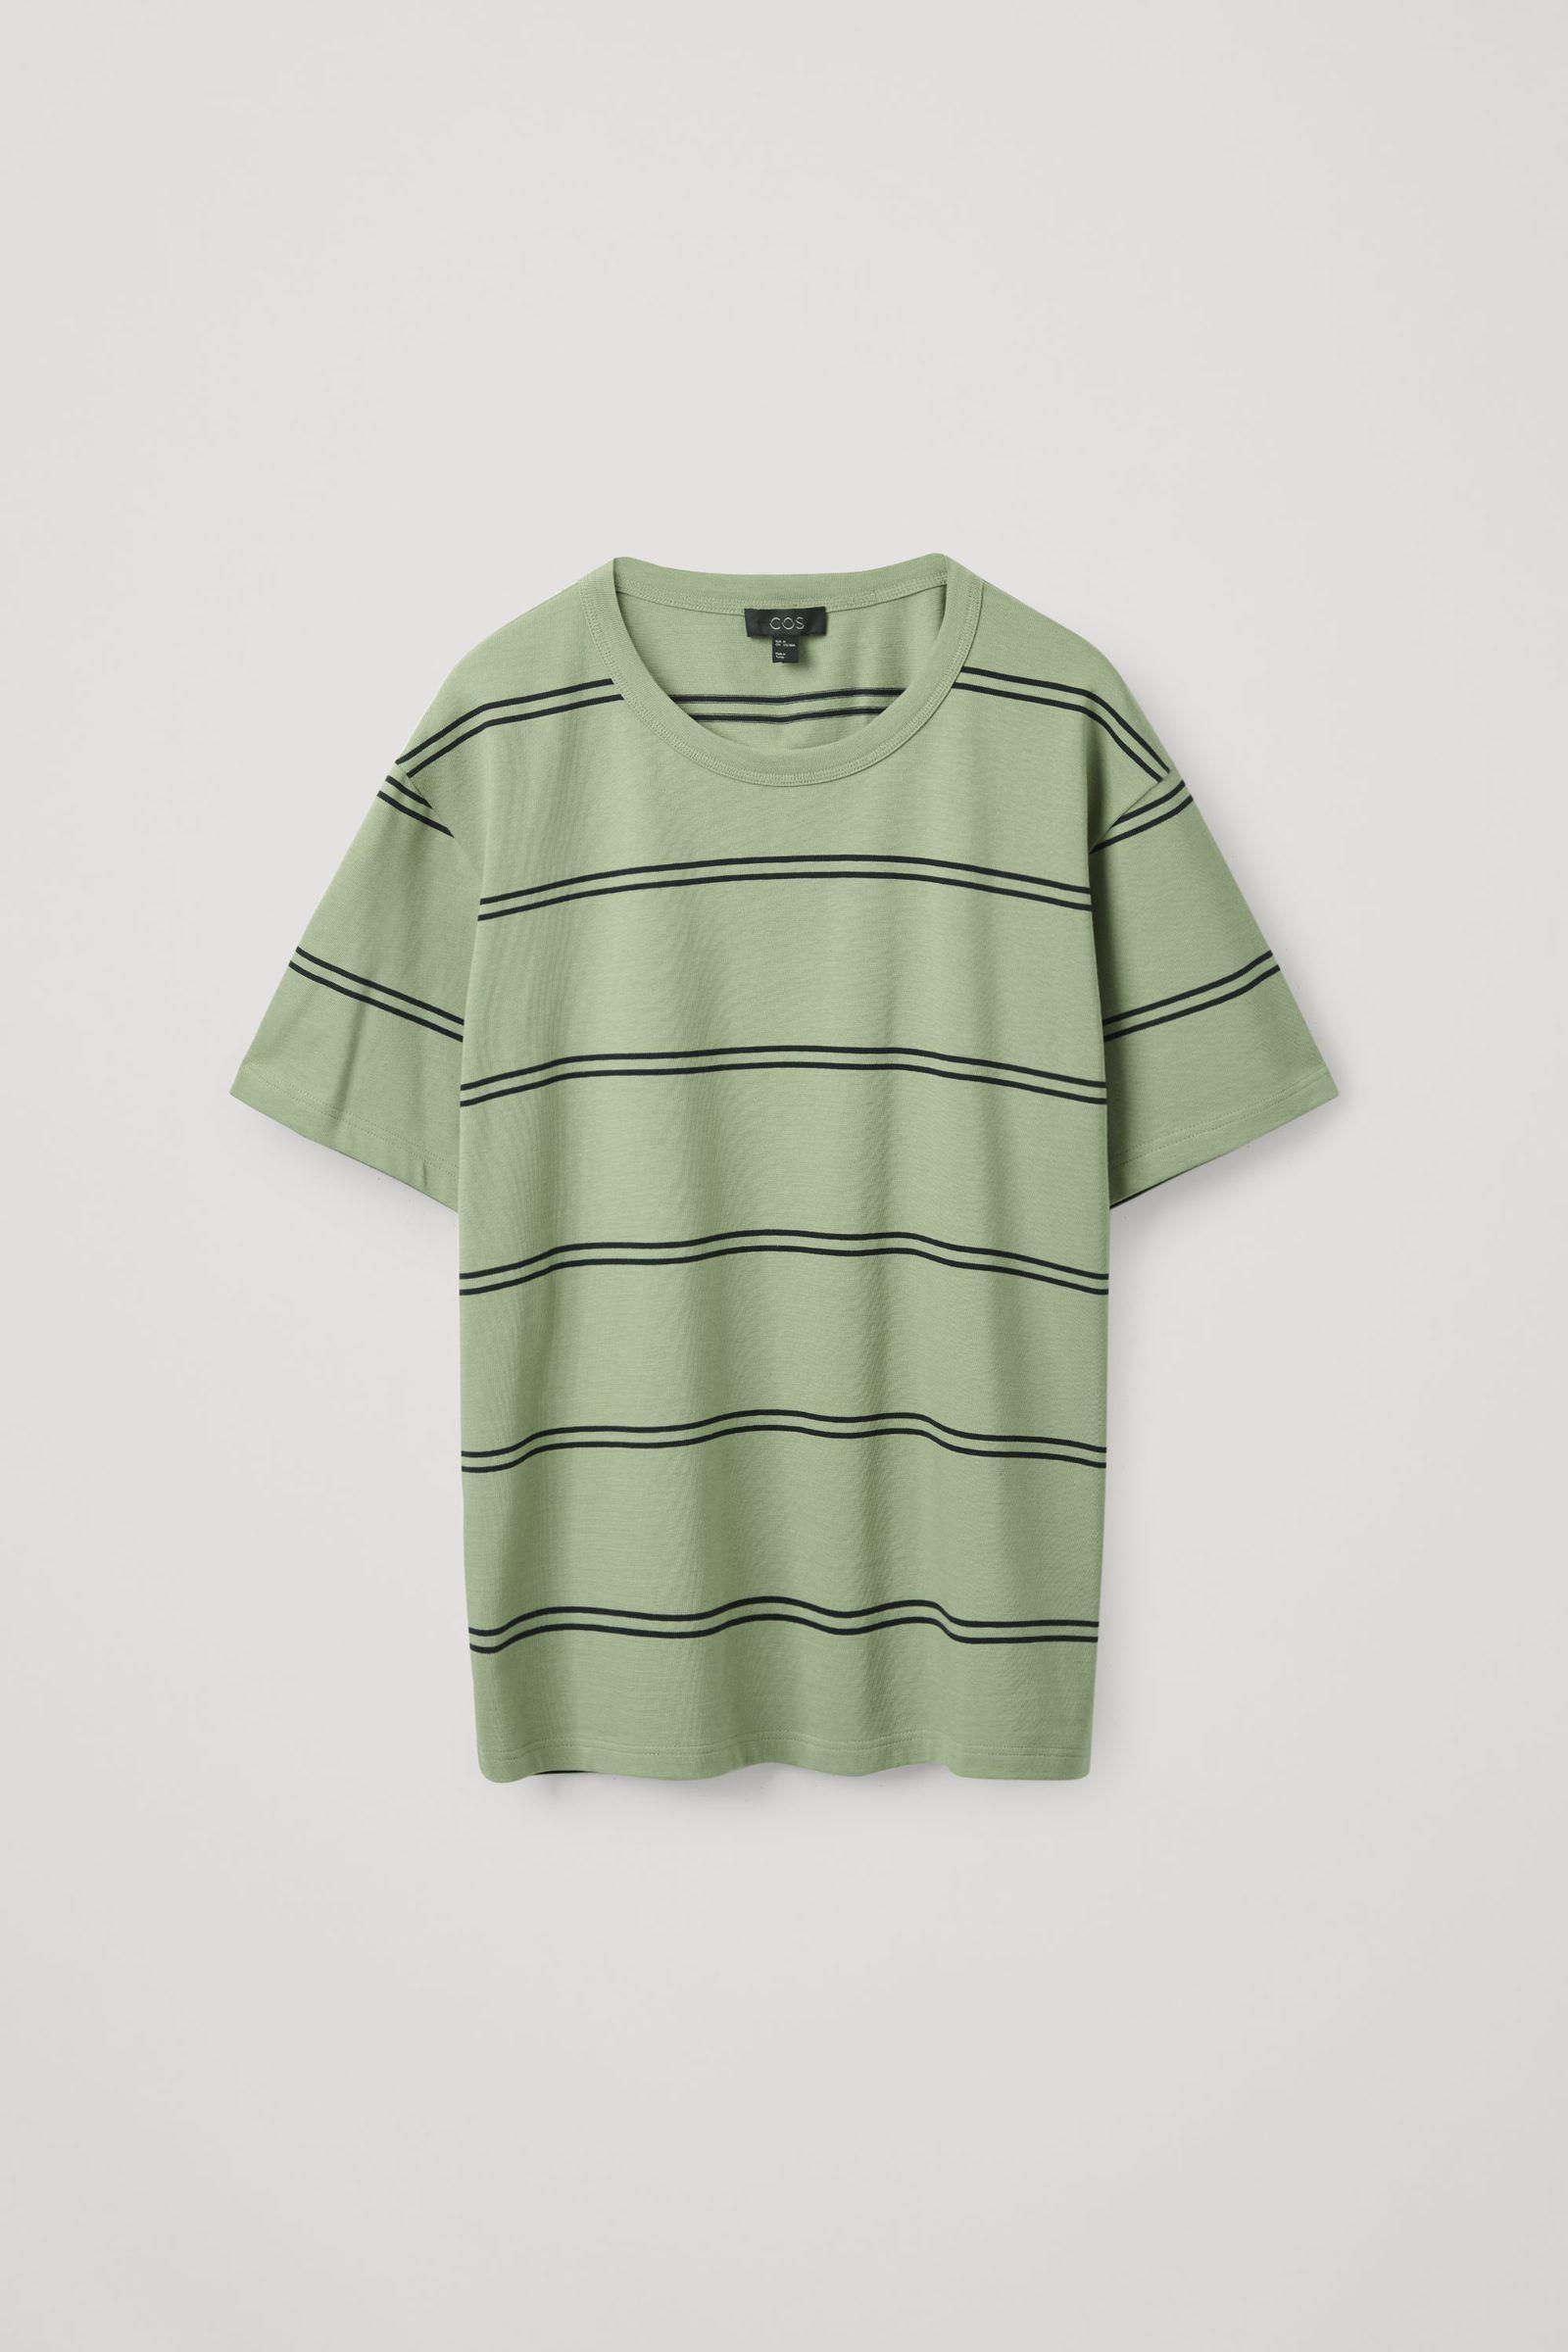 COS 릴랙스드 핏 티셔츠의 라이트 카키 그린 / 블랙컬러 Product입니다.